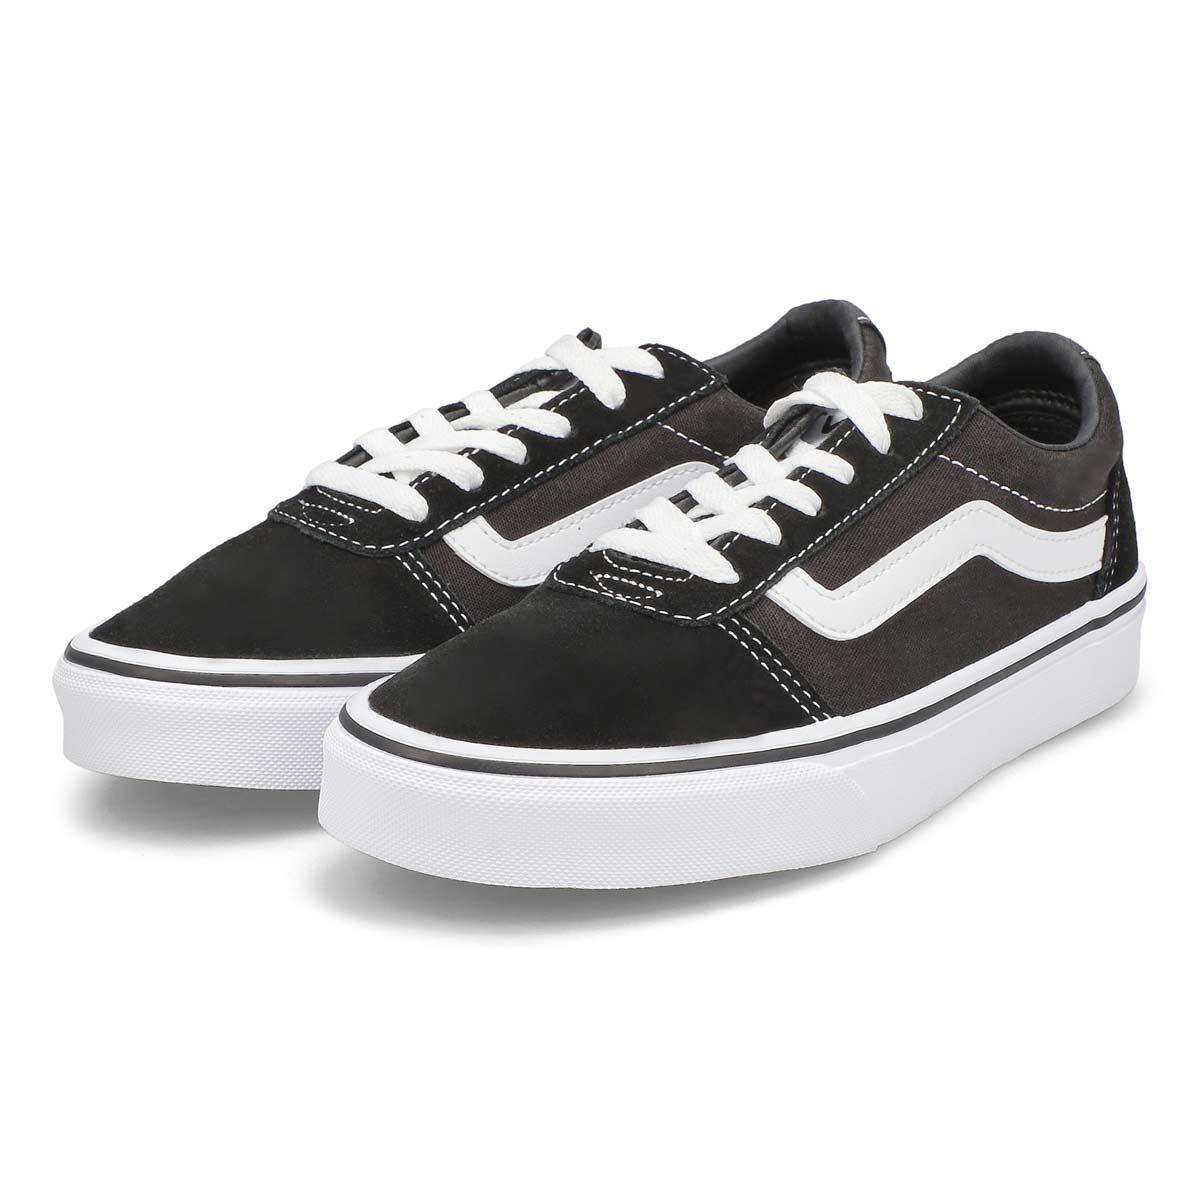 Lds Ward blk/wht lace up sneaker